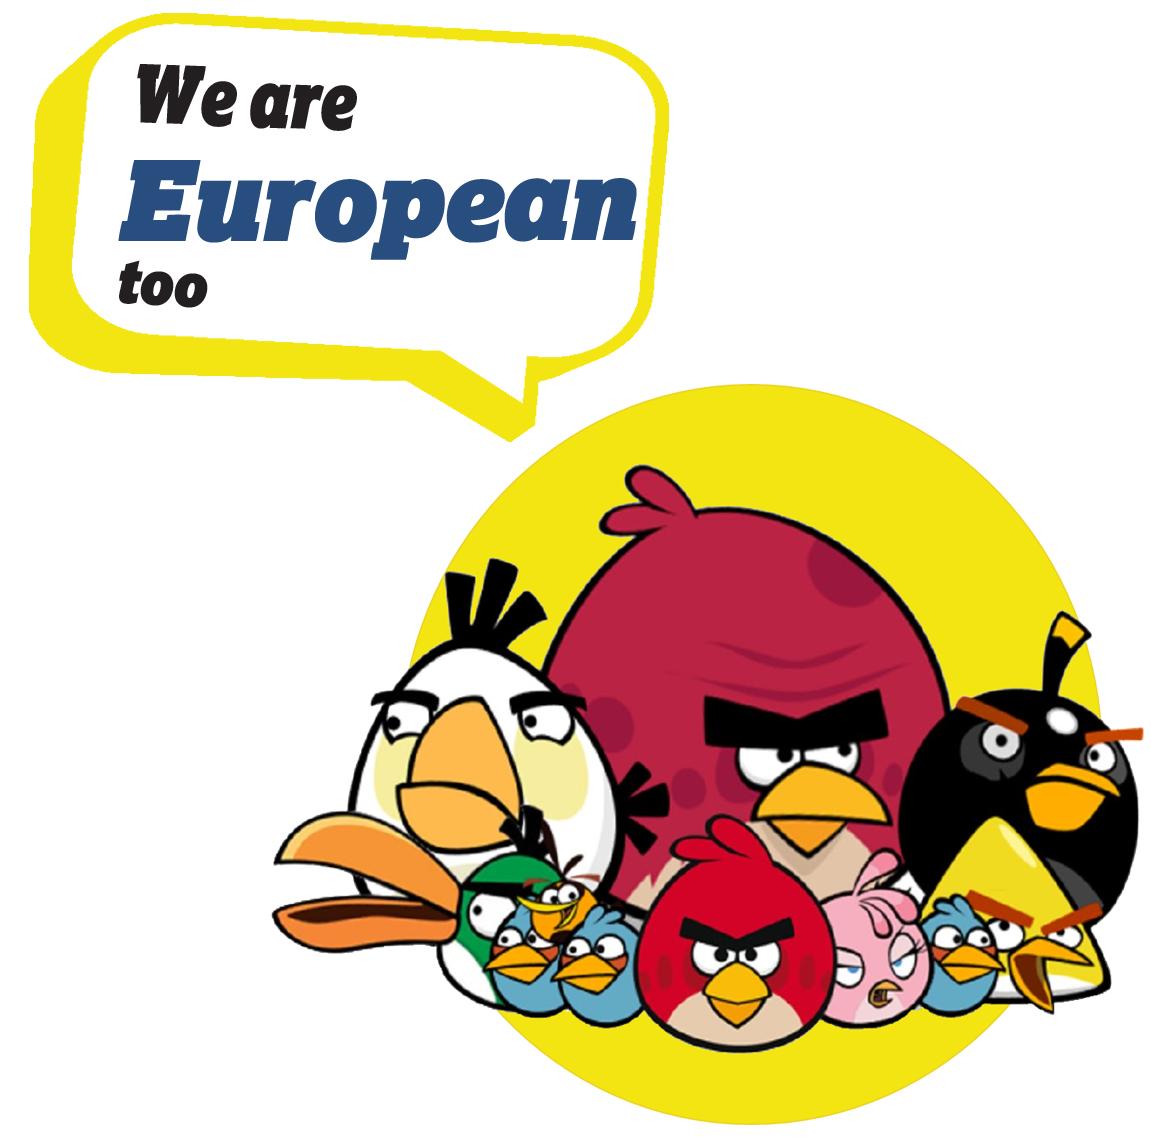 European Characters -European Characters -AngryBirds